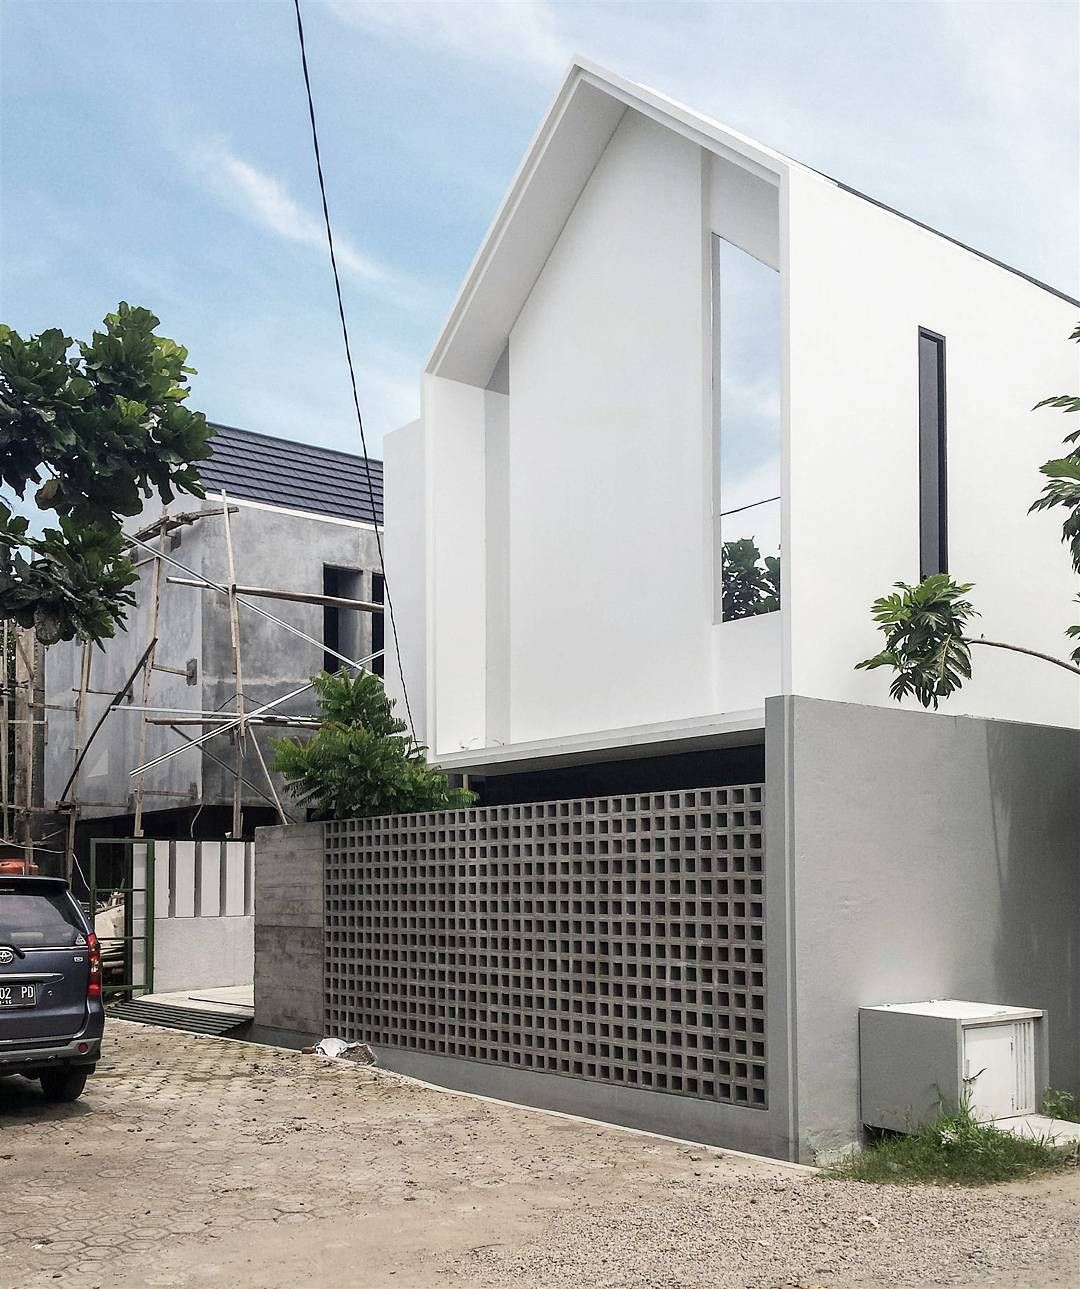 House design indonesia -  Wa House By Dasadani Architecture Arsitek Interior Design Desain